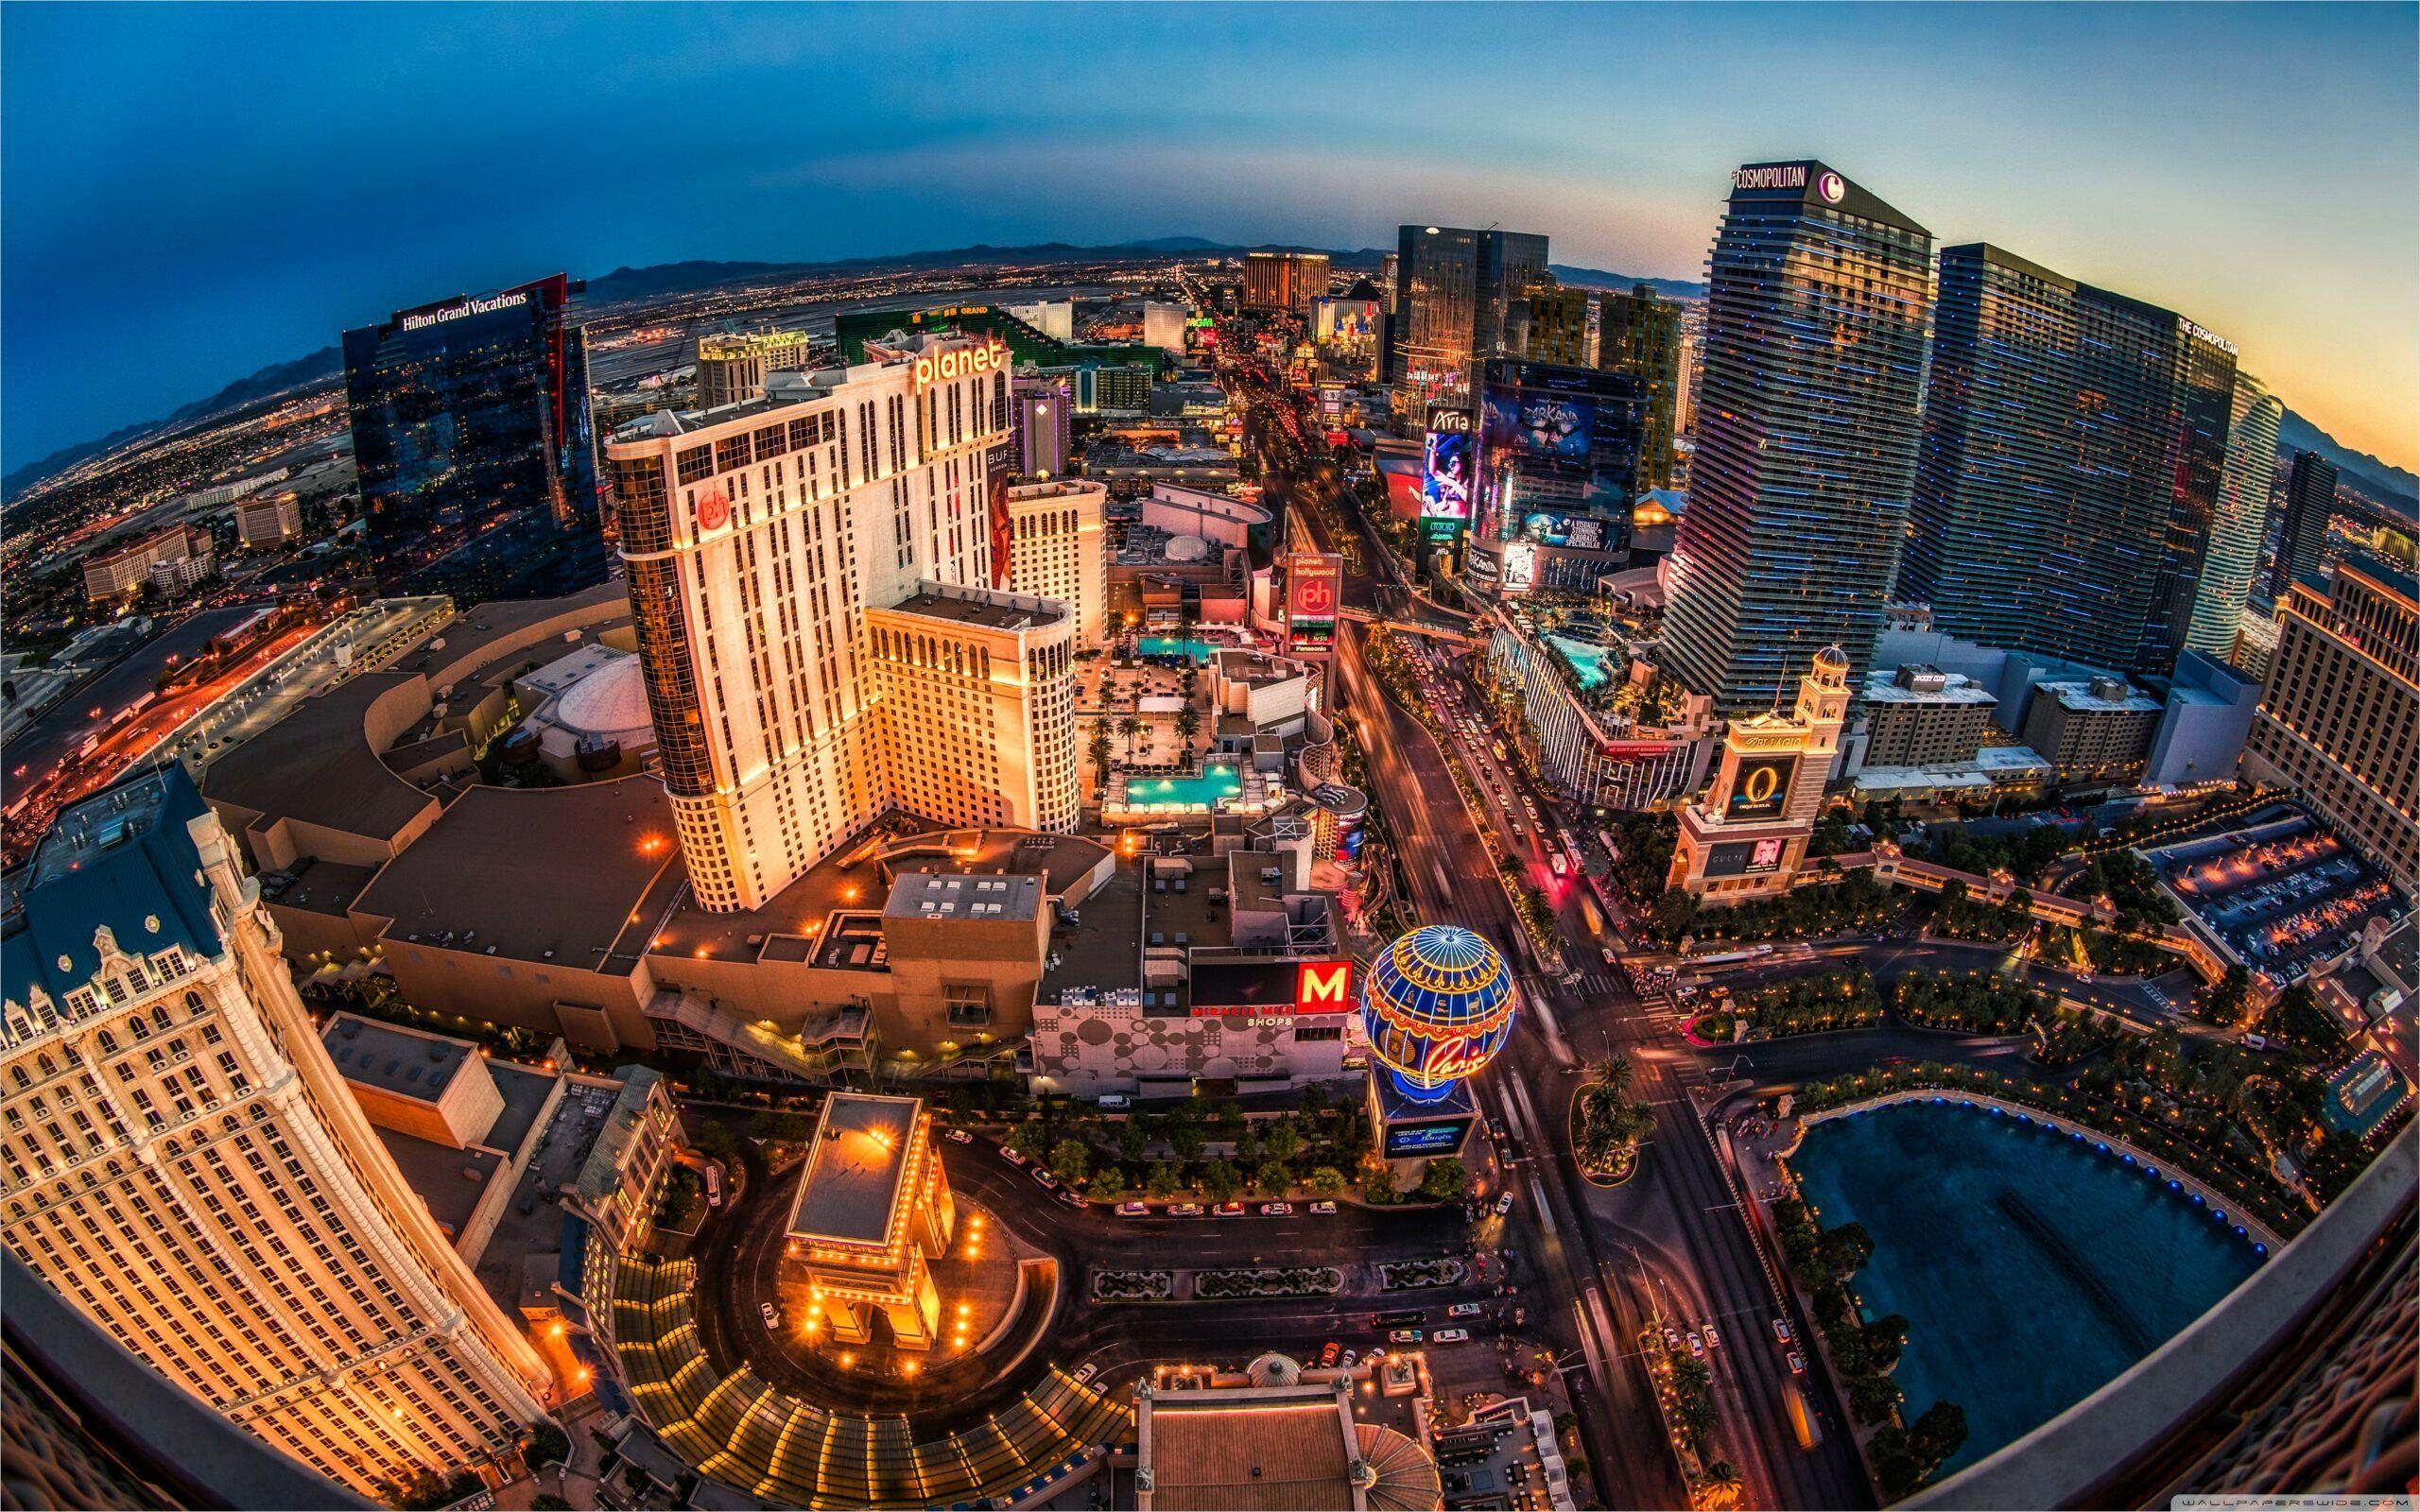 4k Las Vegas Wallpaper In 2020 Casino Las Vegas Las Vegas City Wallpaper